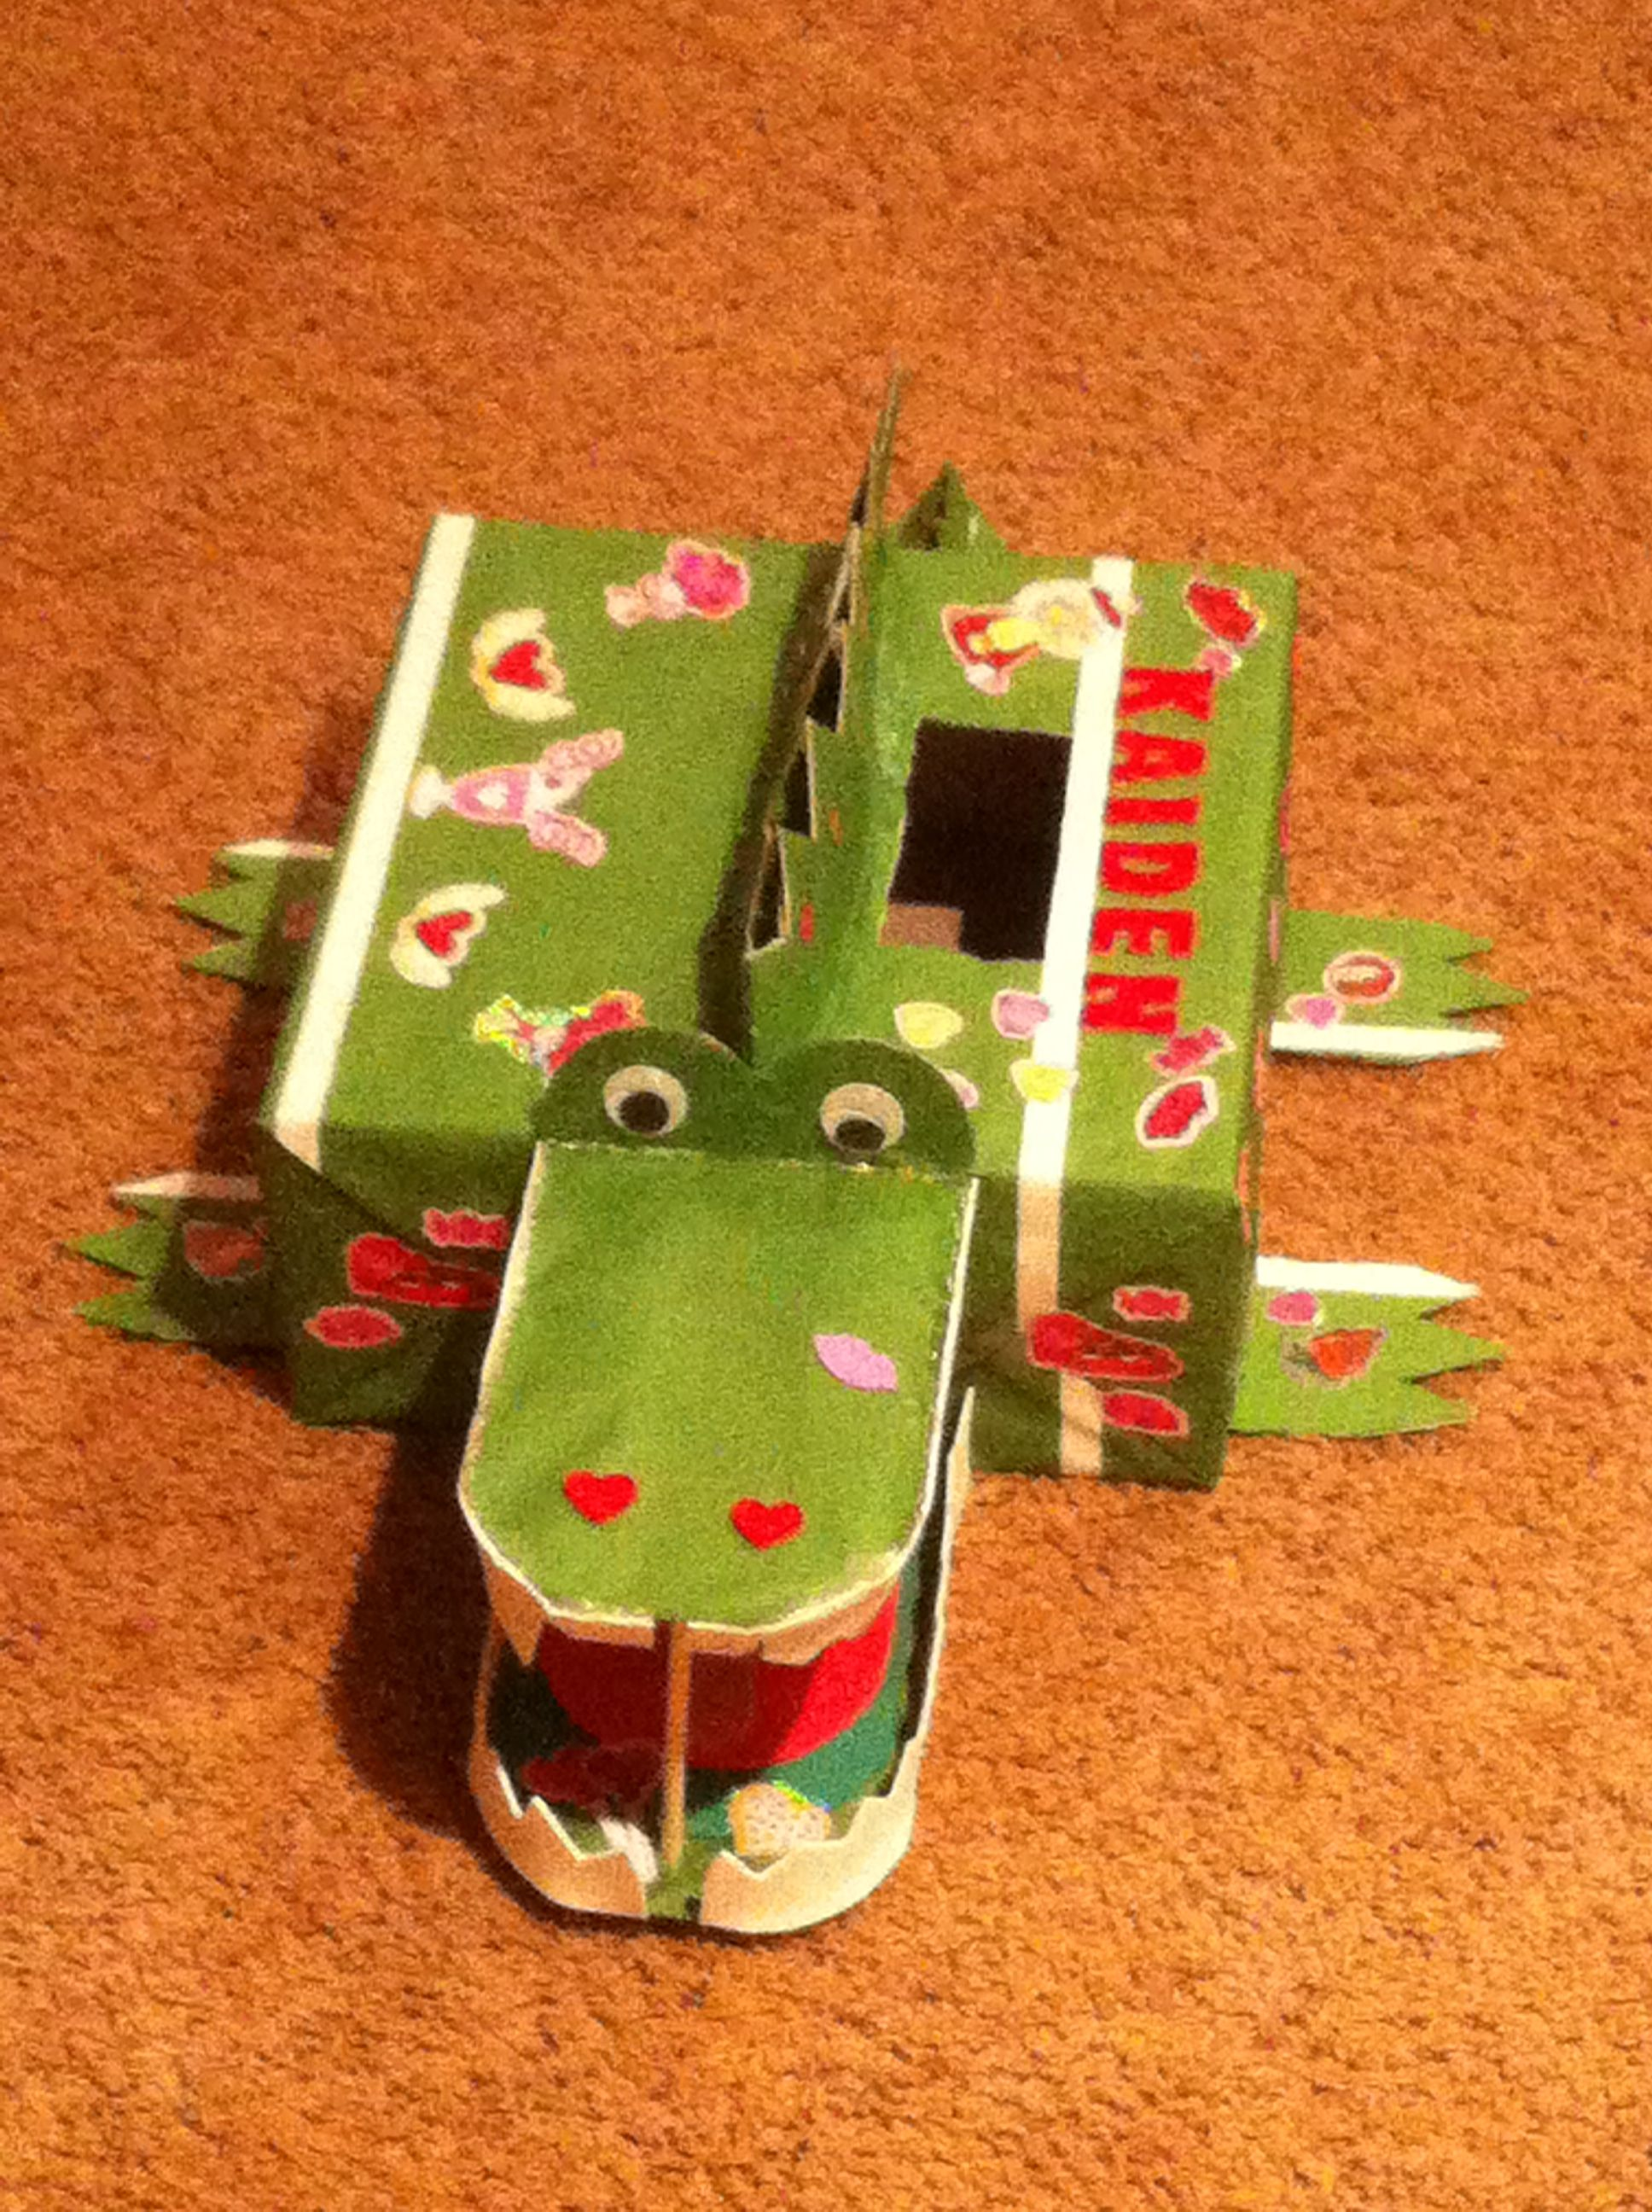 alligator valentine box 2012 my son got 1st place on it too